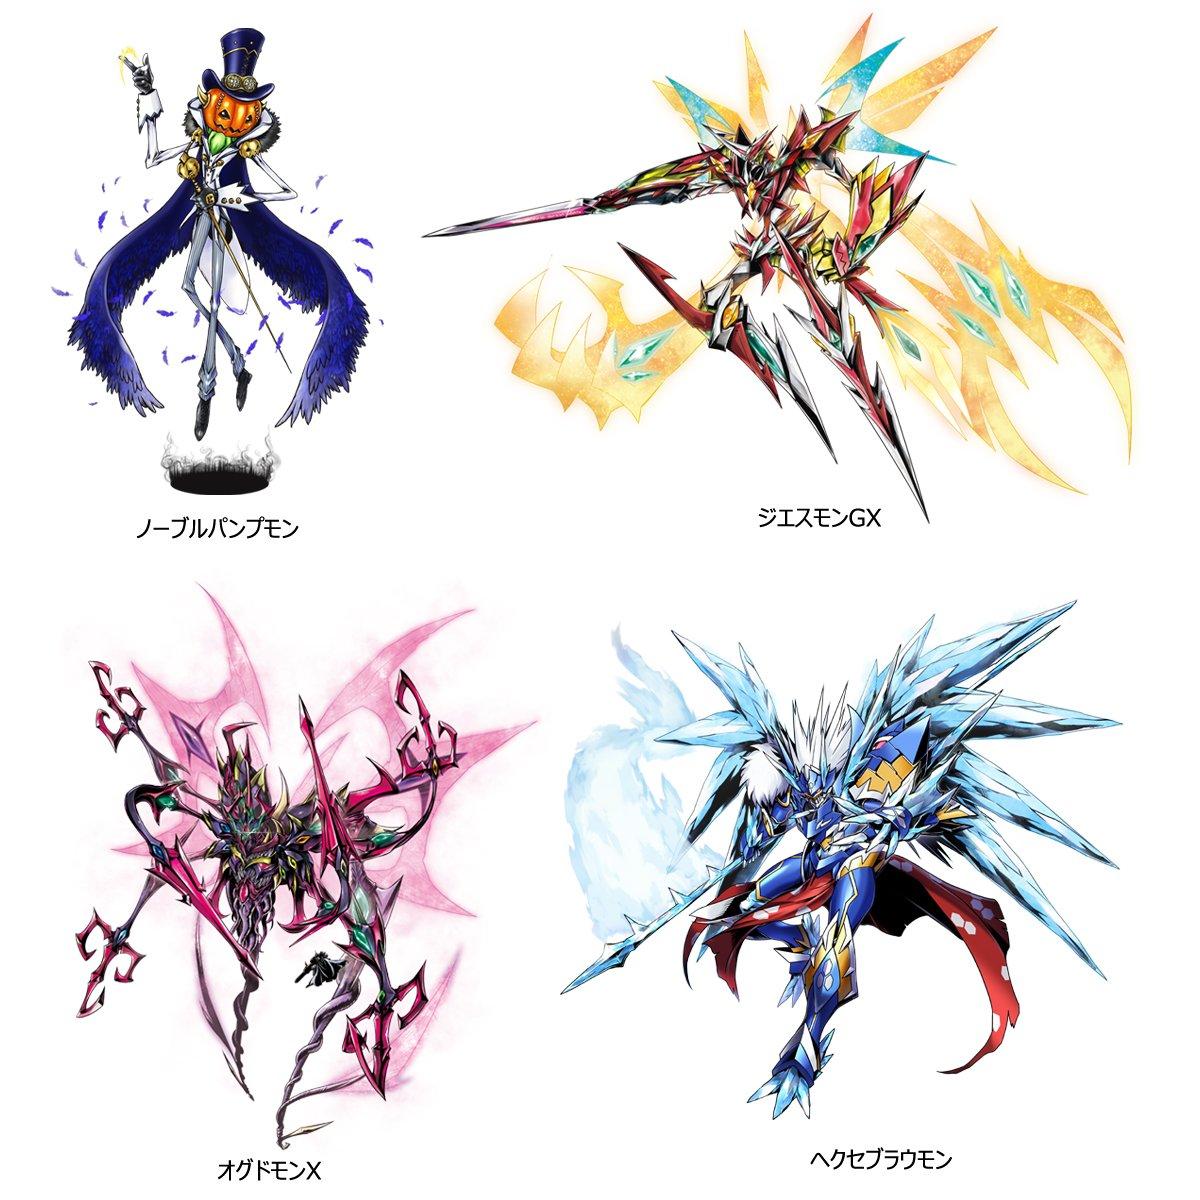 Digimon Tweets On Twitter Zeedmilleniumon Is Stronger Than Alphamon And Omegamon X And, again omnimon (omegamon), leader of royal knights when alphamon is absent. stronger than alphamon and omegamon x